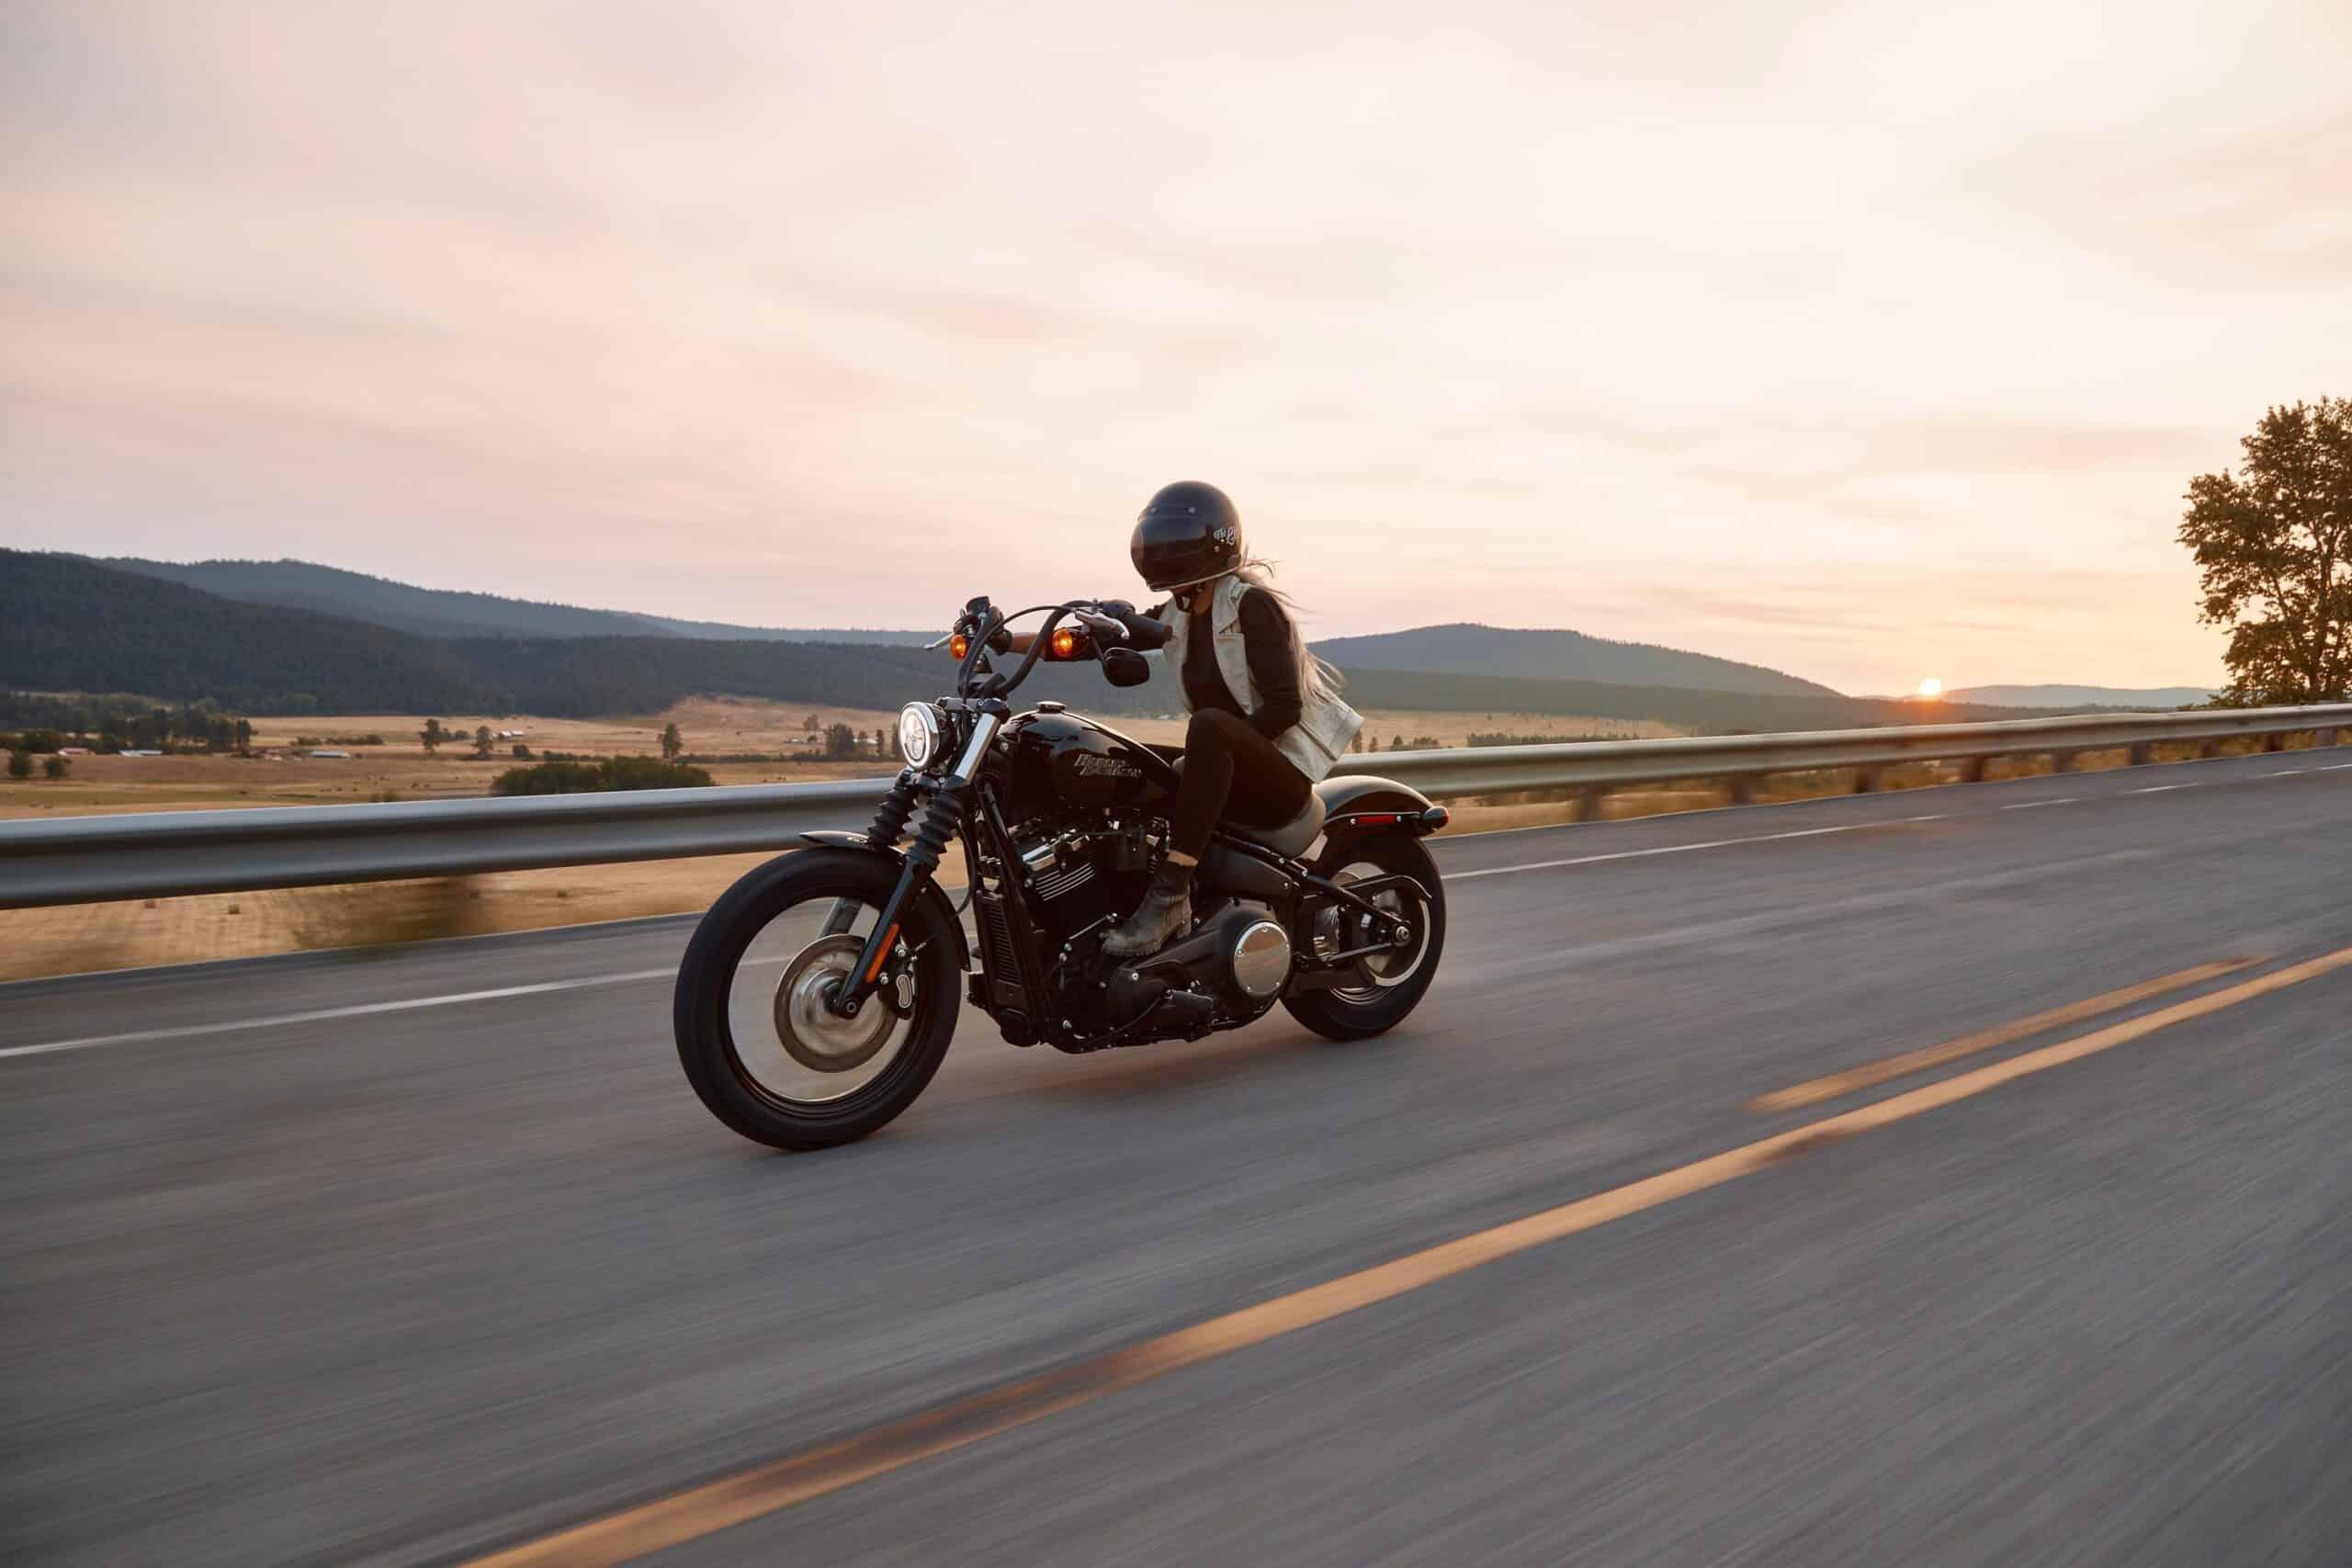 Motorcycle Insurance in Arizona